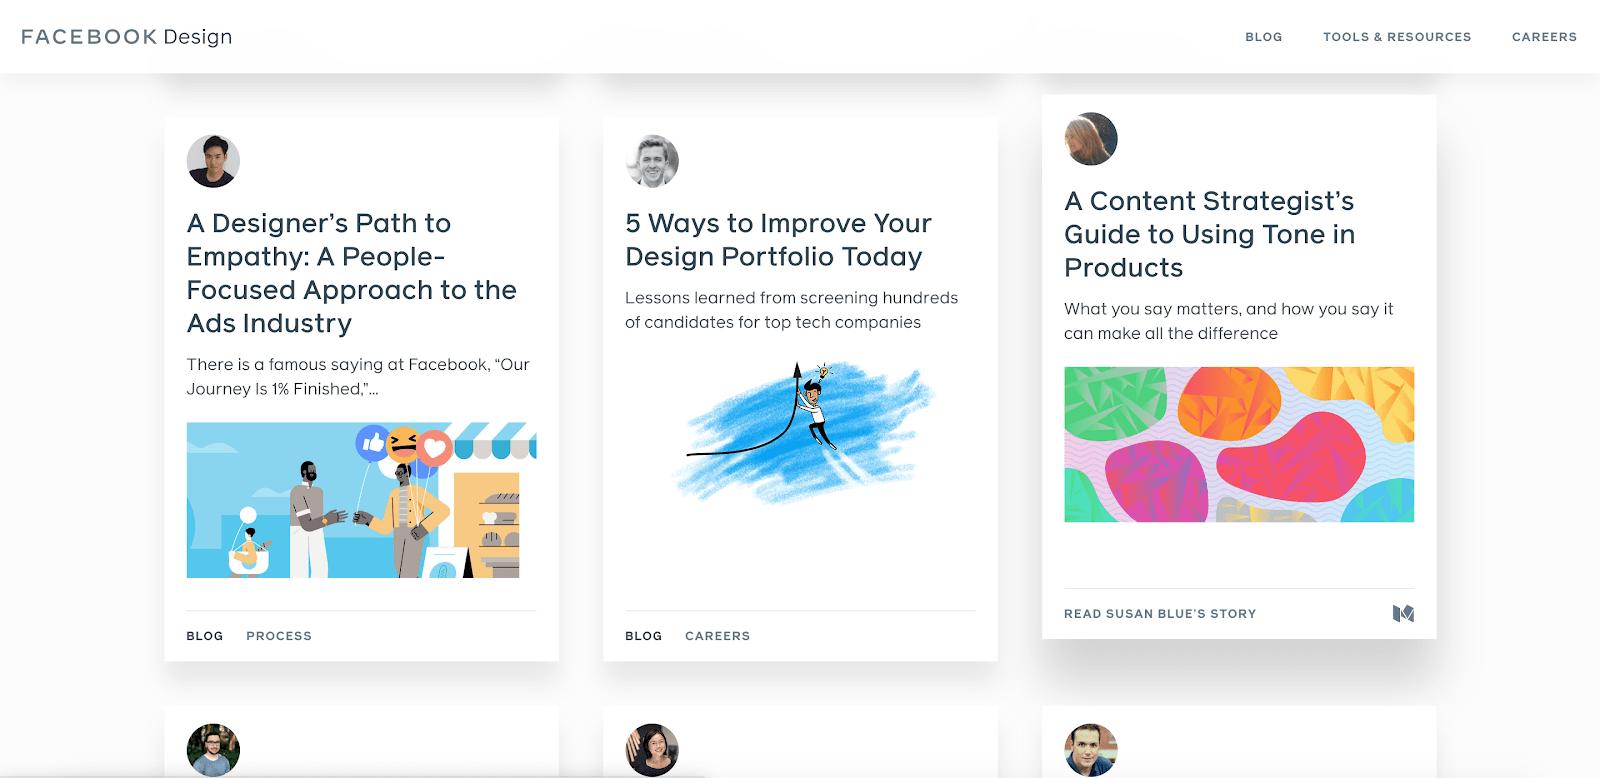 facebook design blog